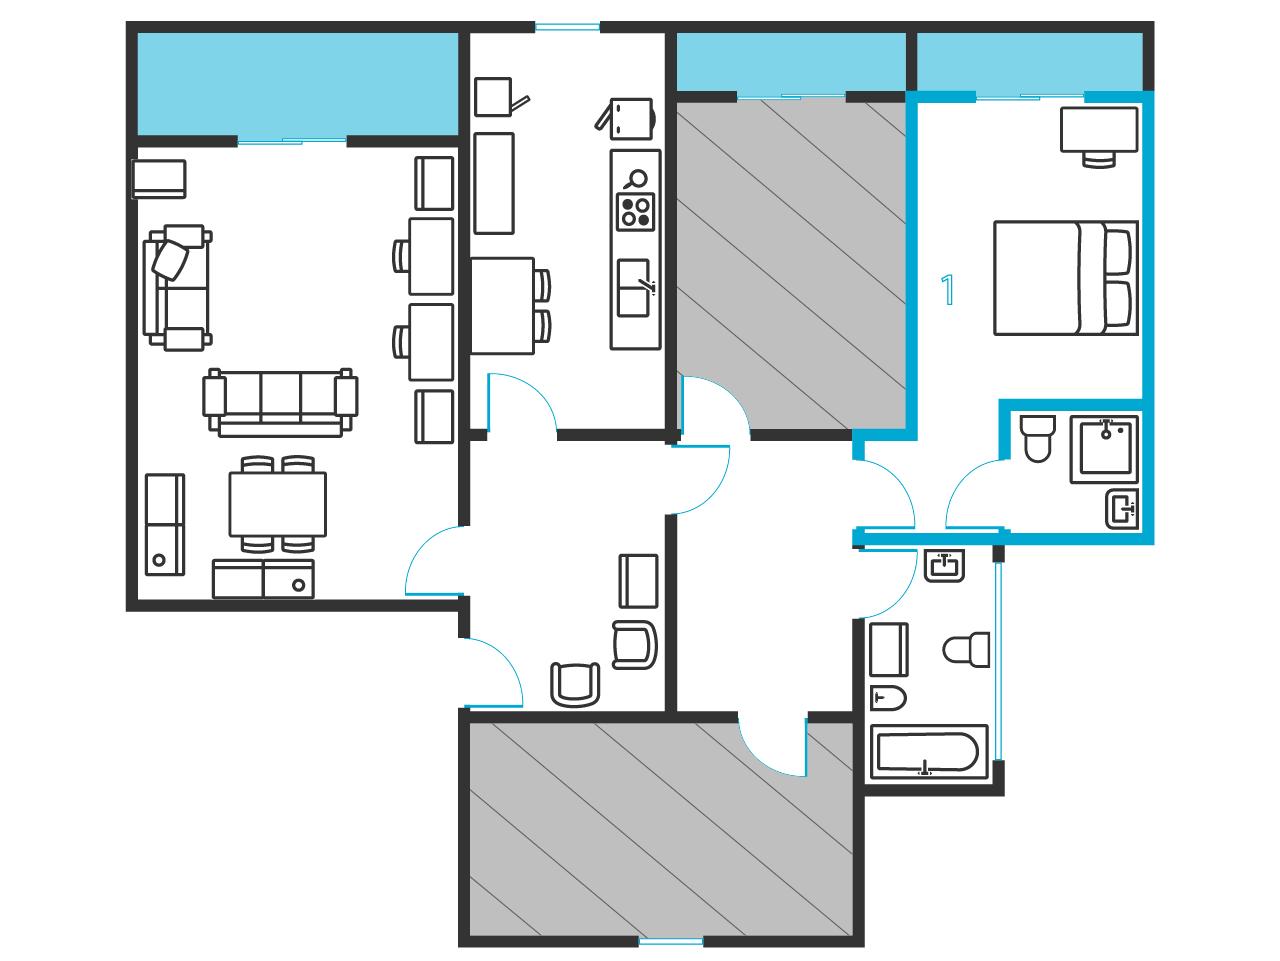 Bad In Slaapkamer Ervaring : Tweepersoons slaapkamer, met balkon, in 3 ...